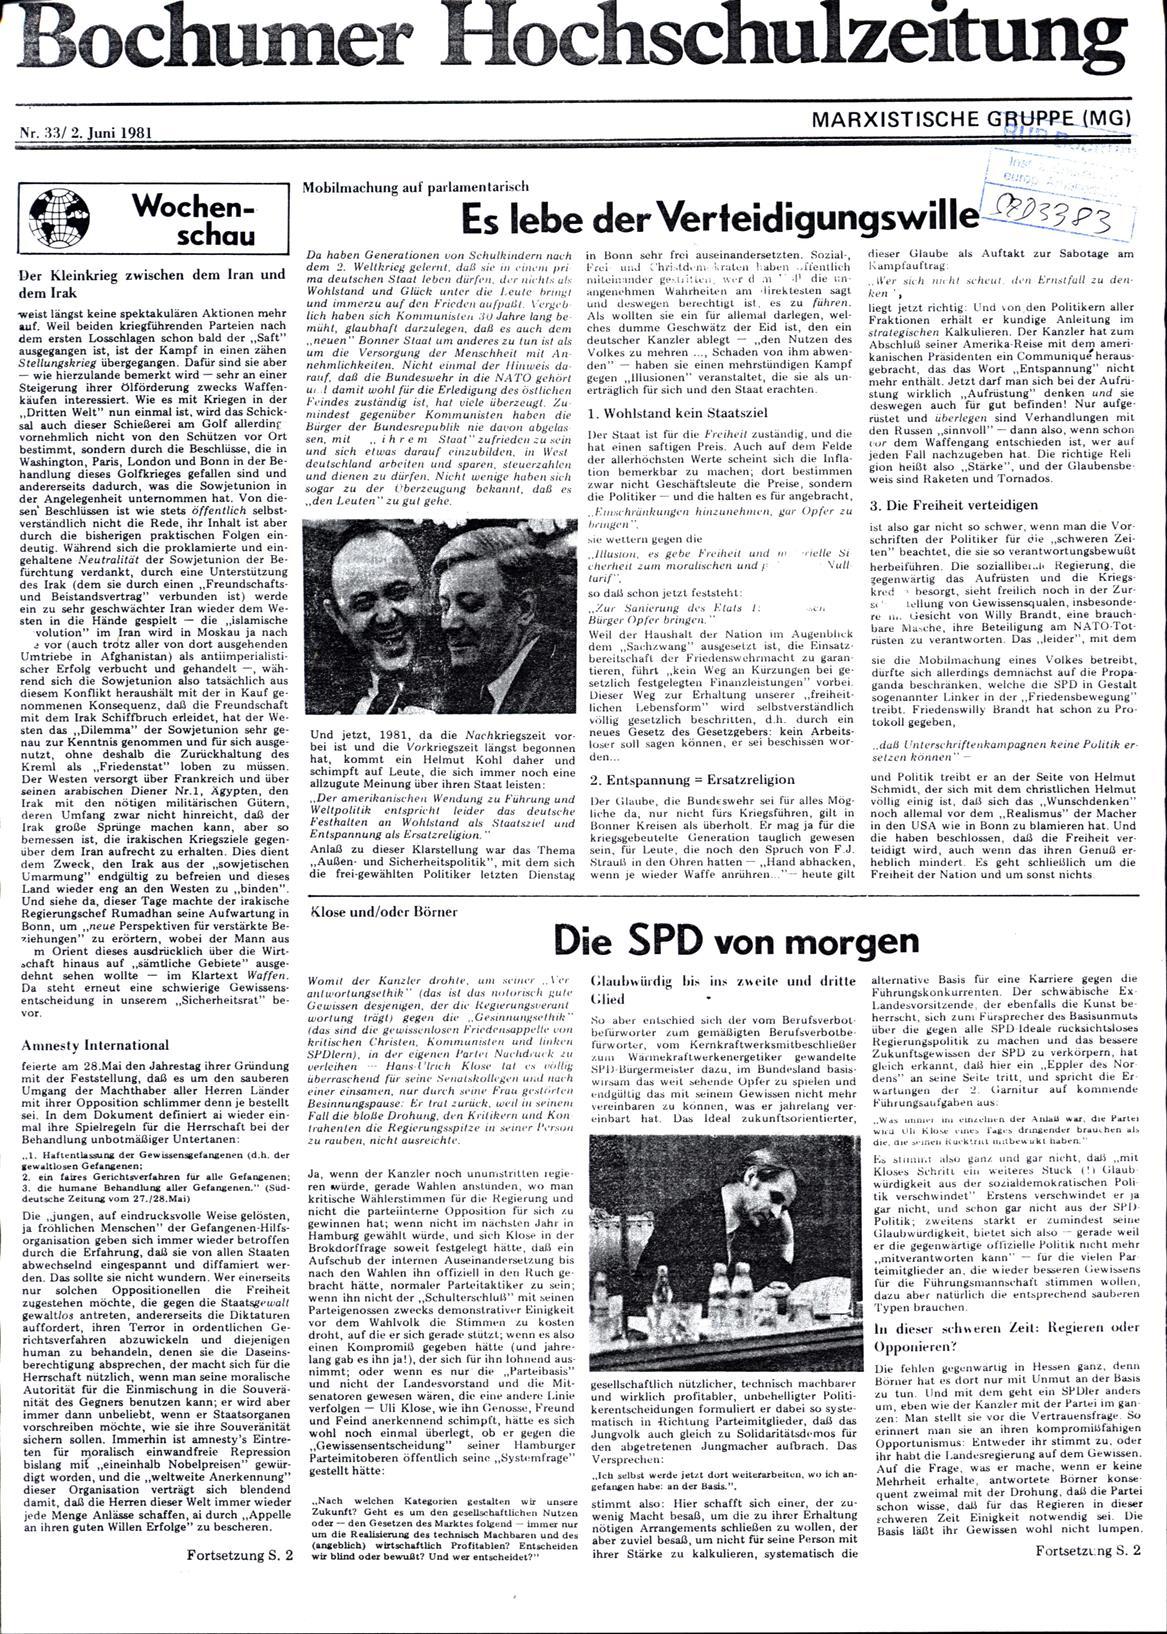 Bochum_BHZ_19810602_033_001